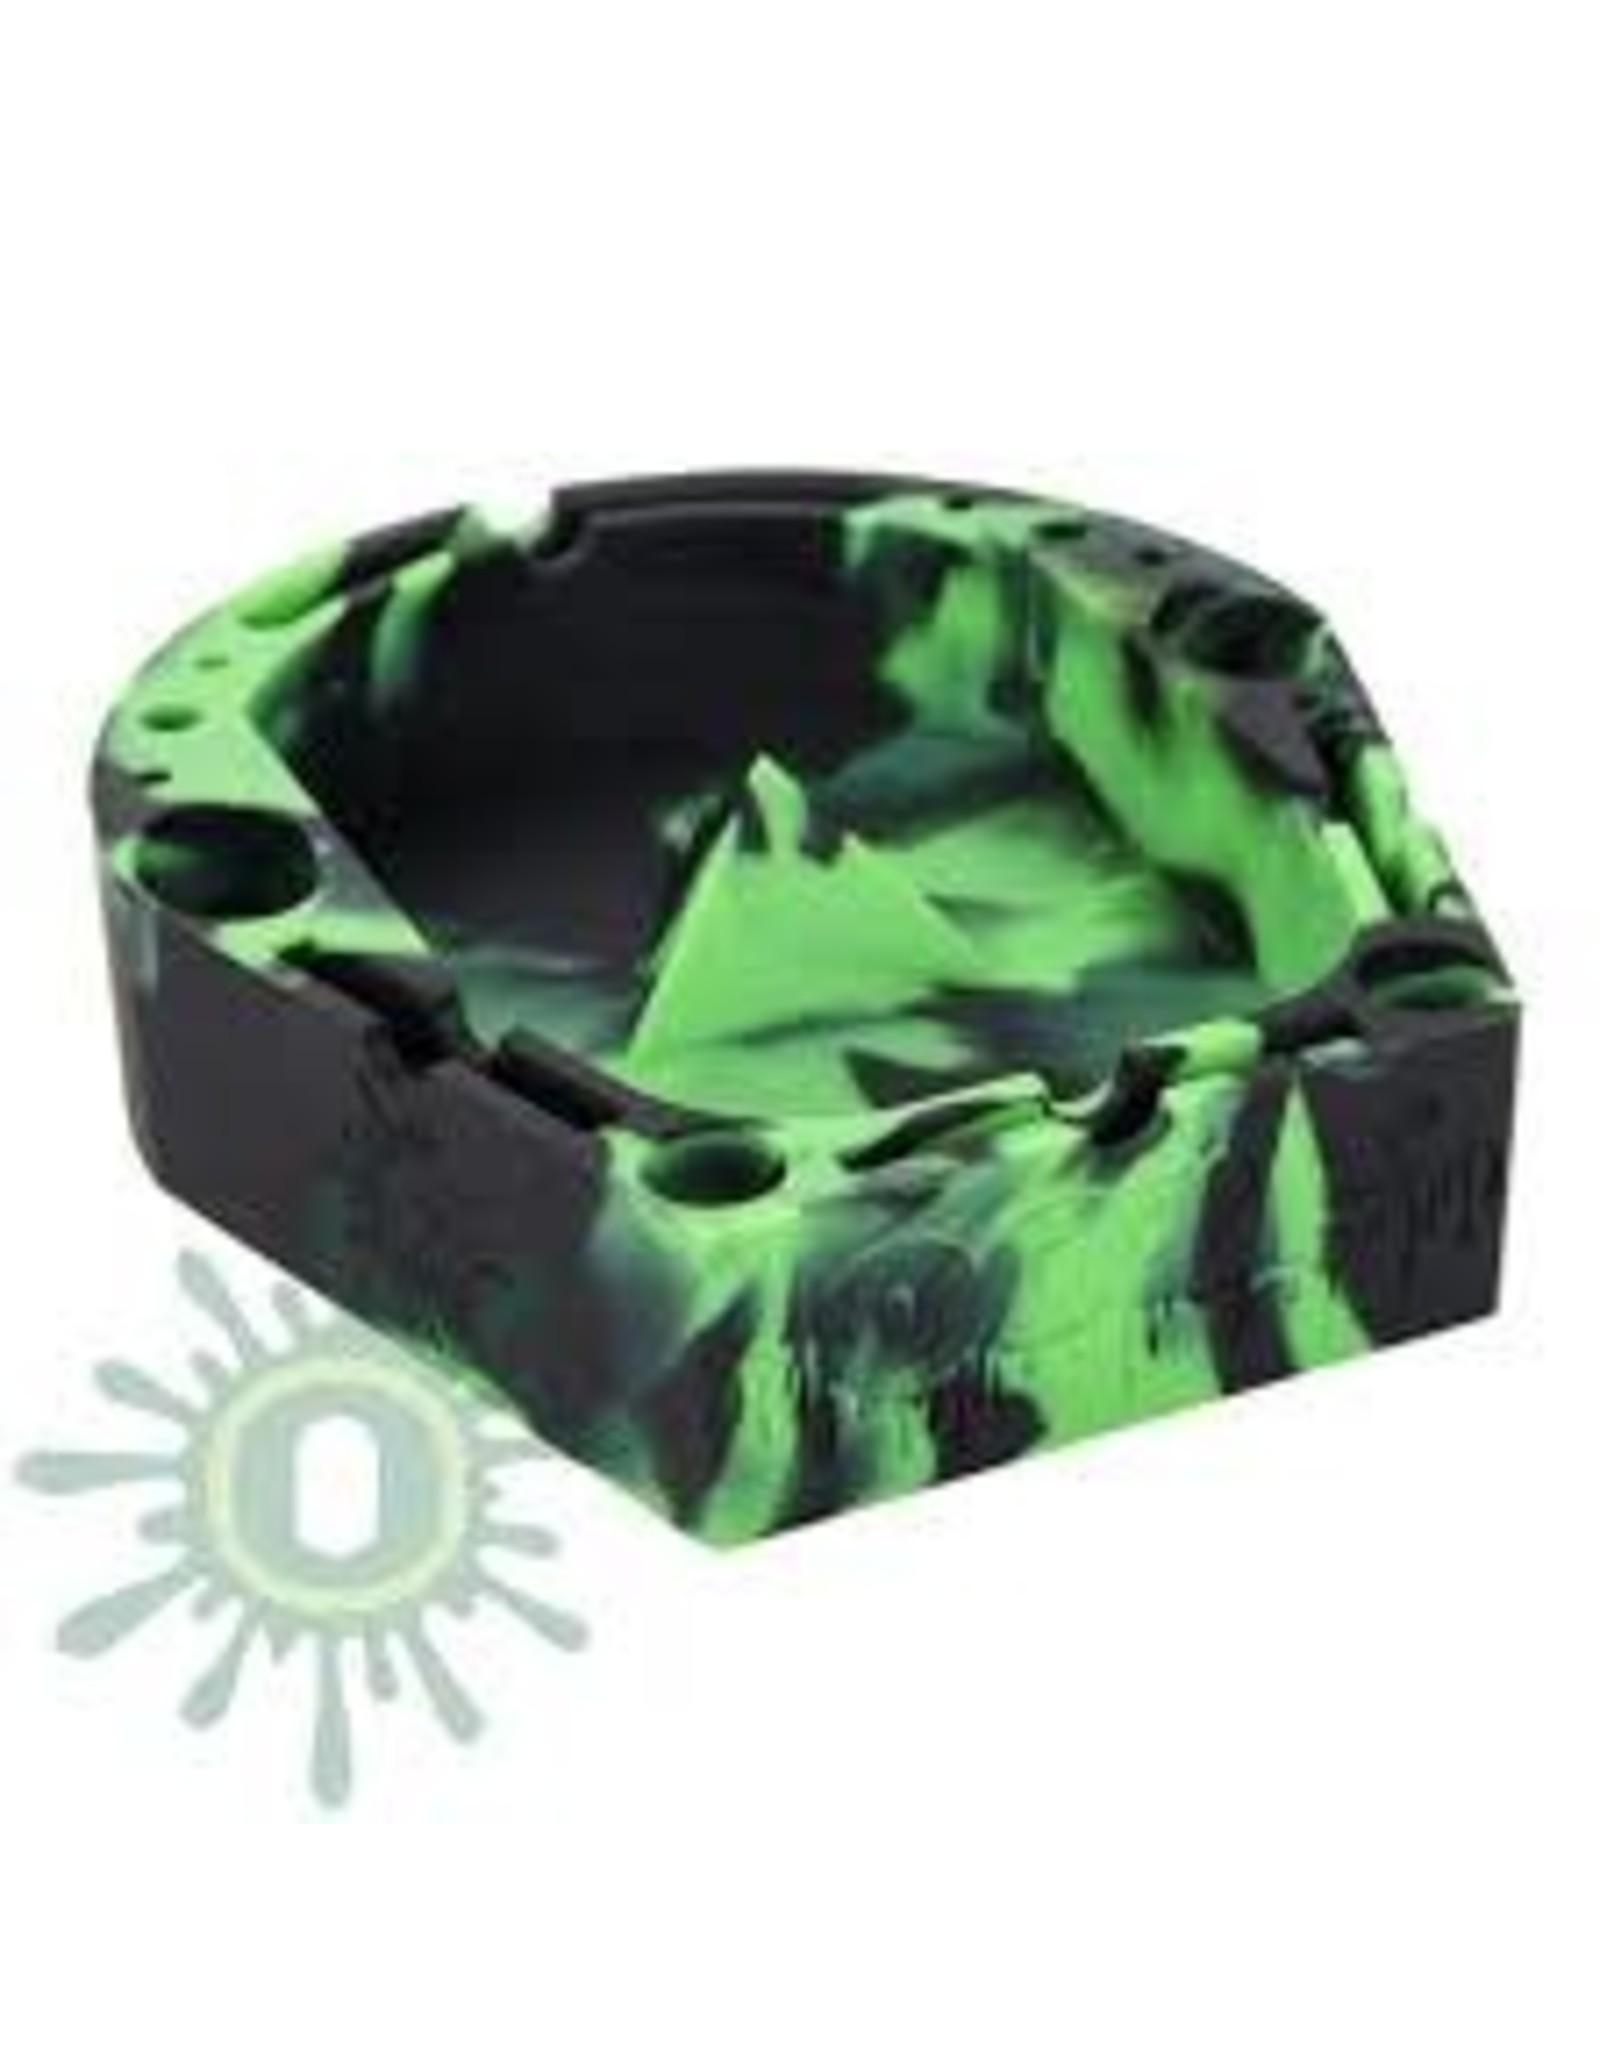 OOZE Banger Silicone Ashtray - GREEN / BLACK